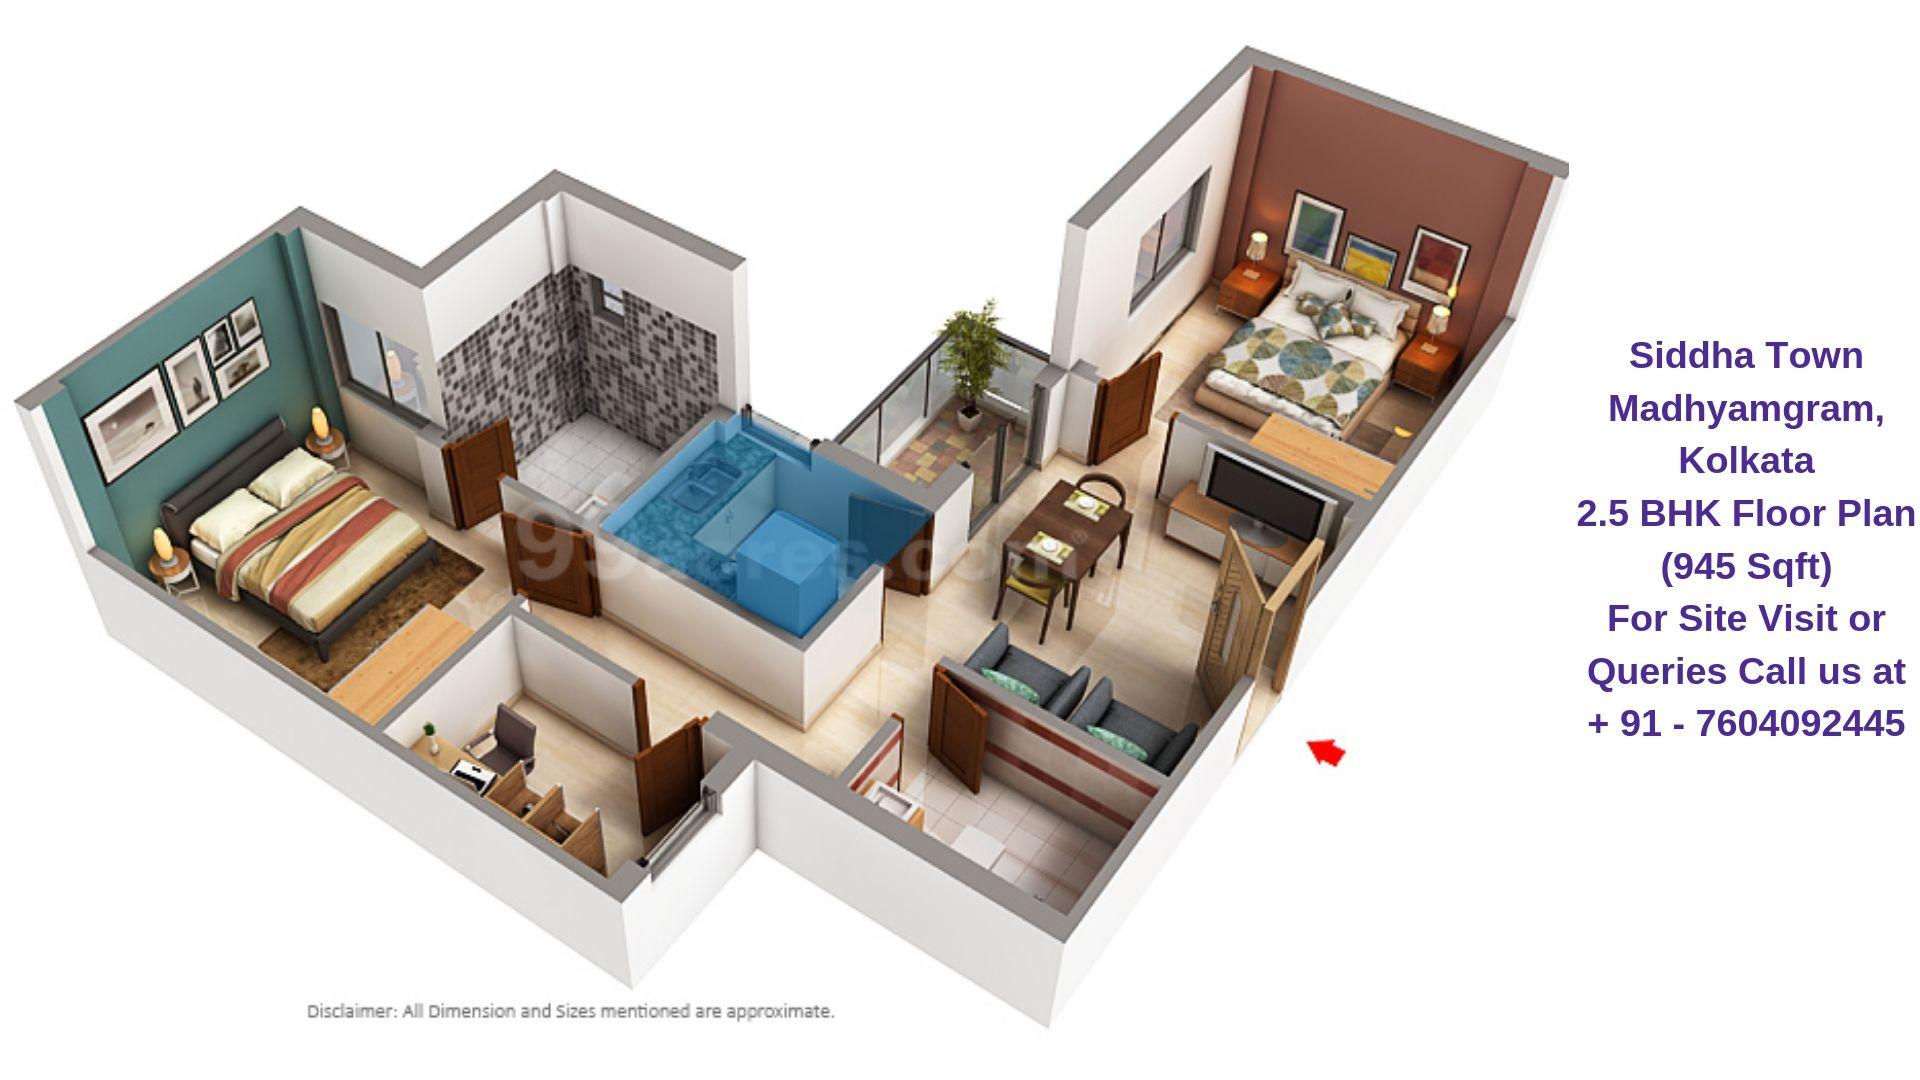 Siddha Town Madhyamgram, Kolkata 2.5 BHK Floor Plan 945 Sqft